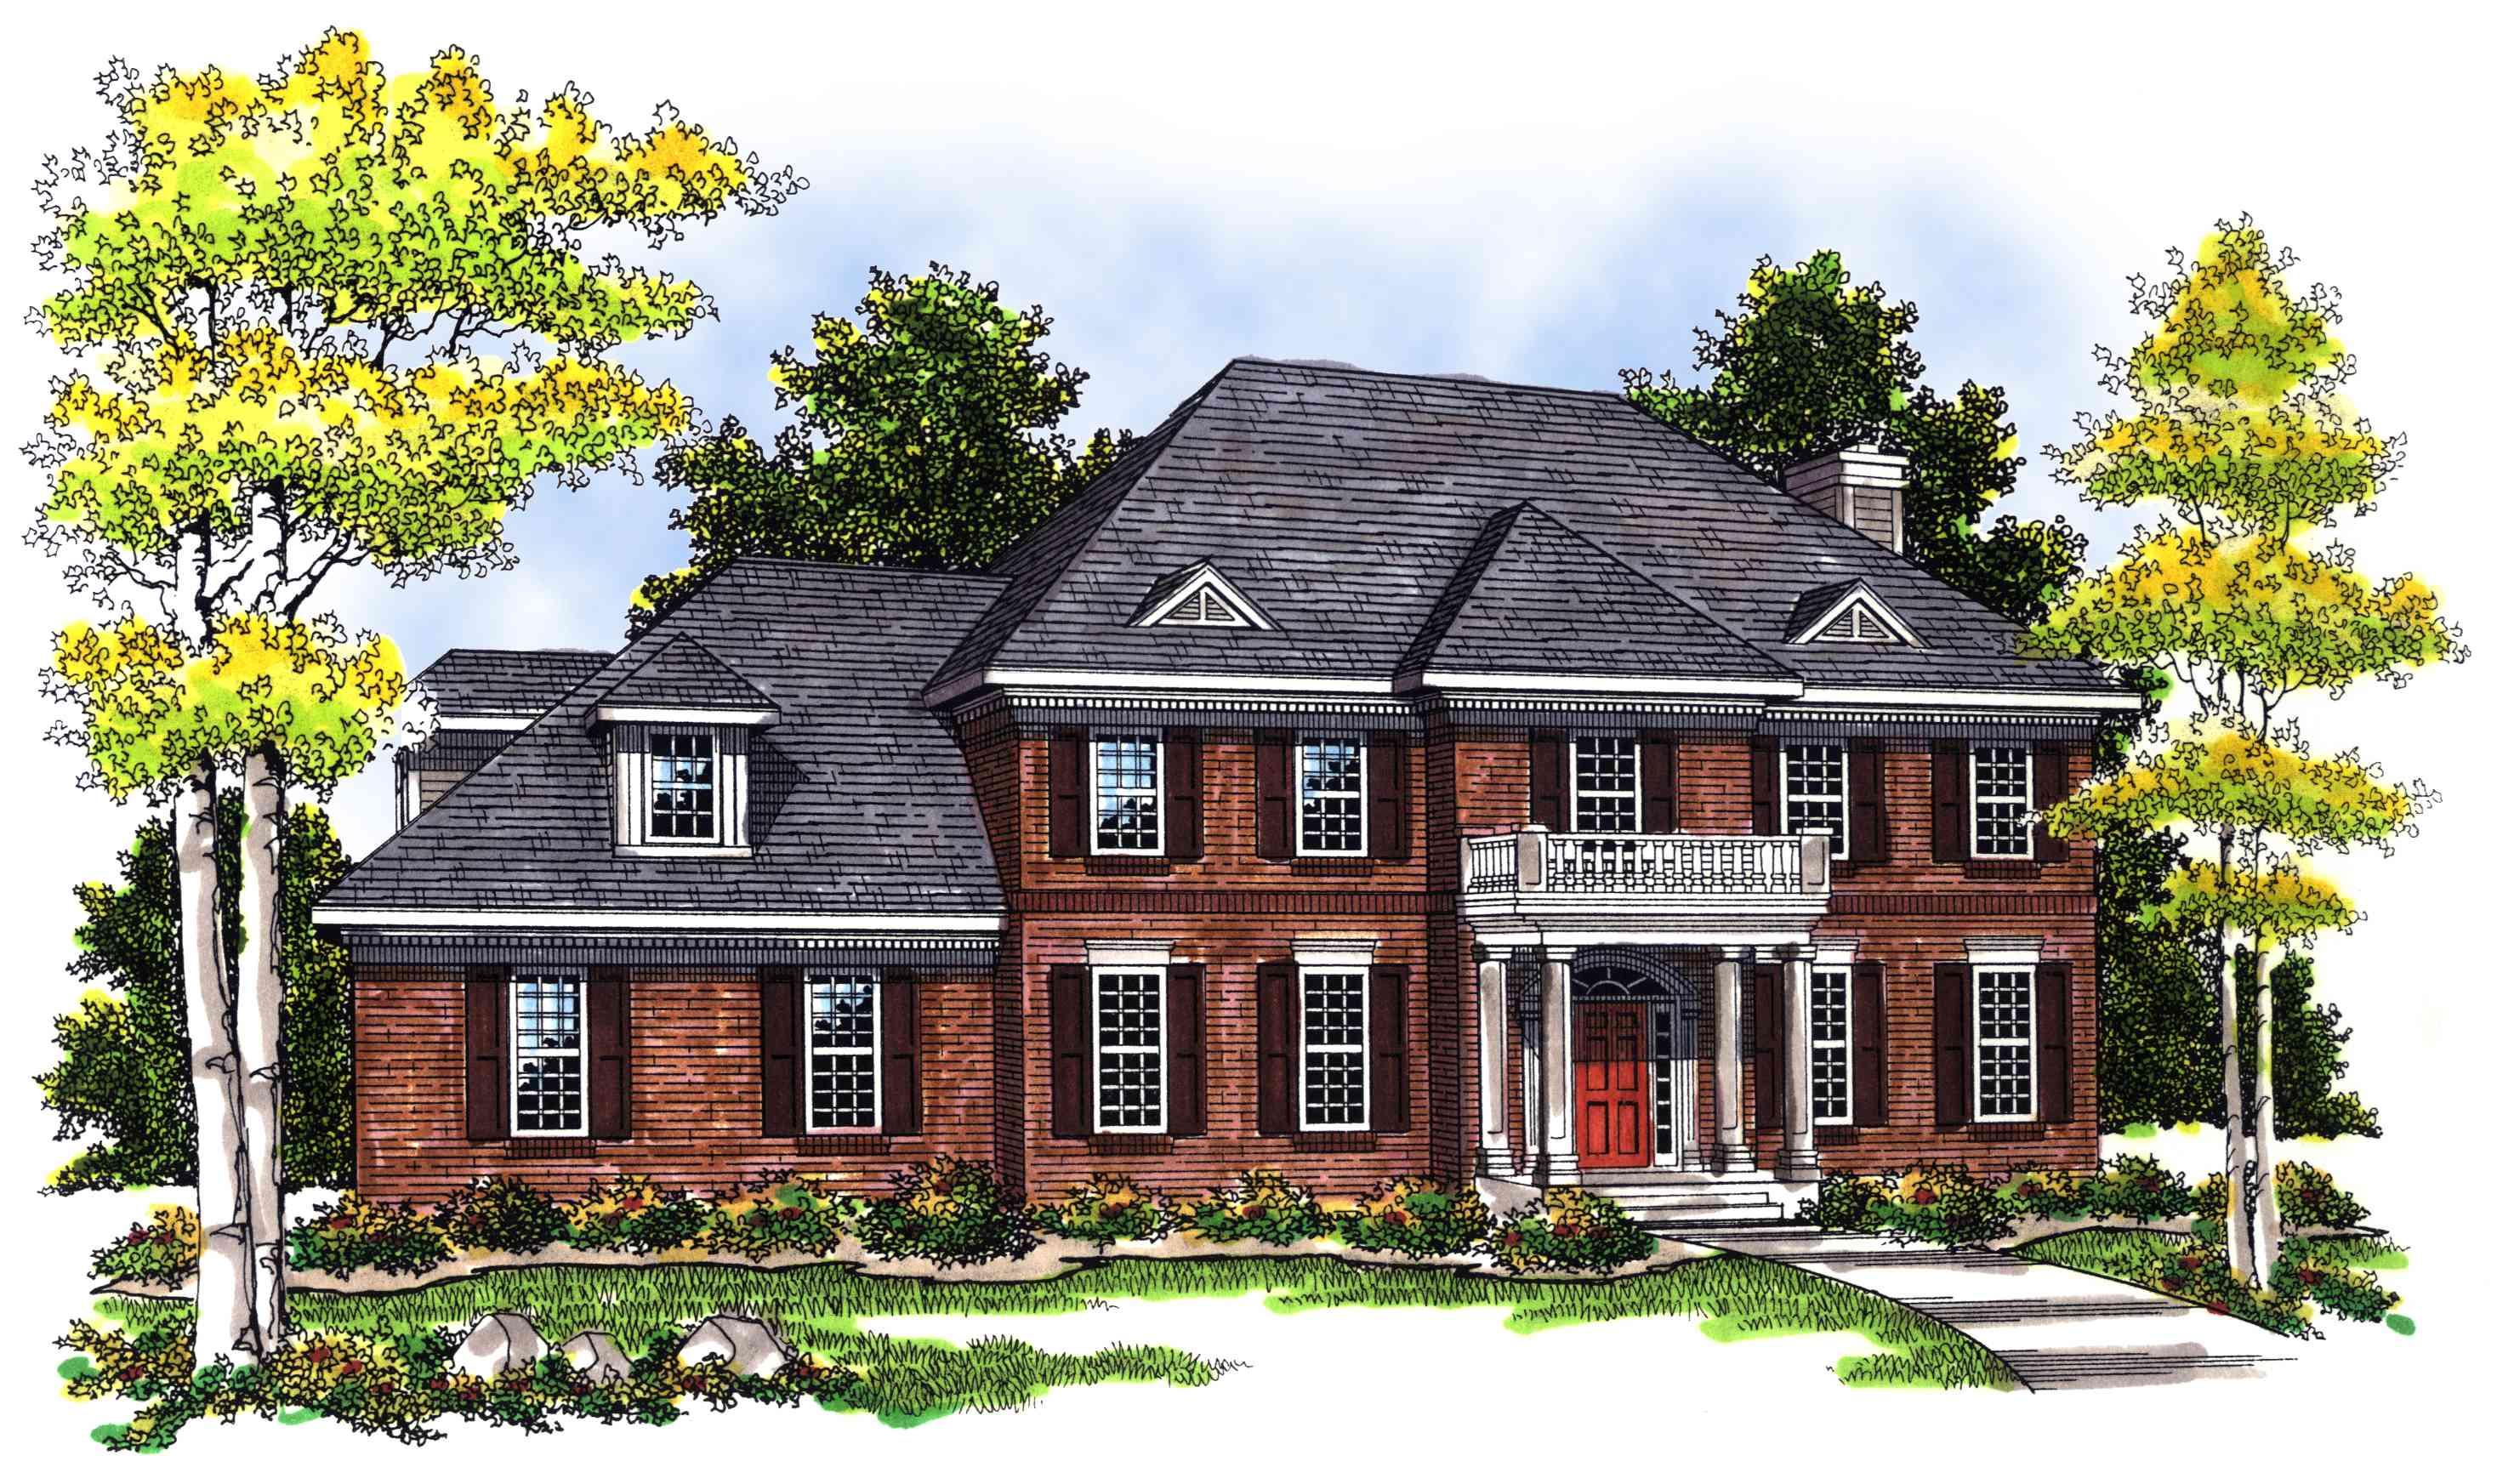 2 Story Brick Home Plan 89450ah 1st Floor Master Suite